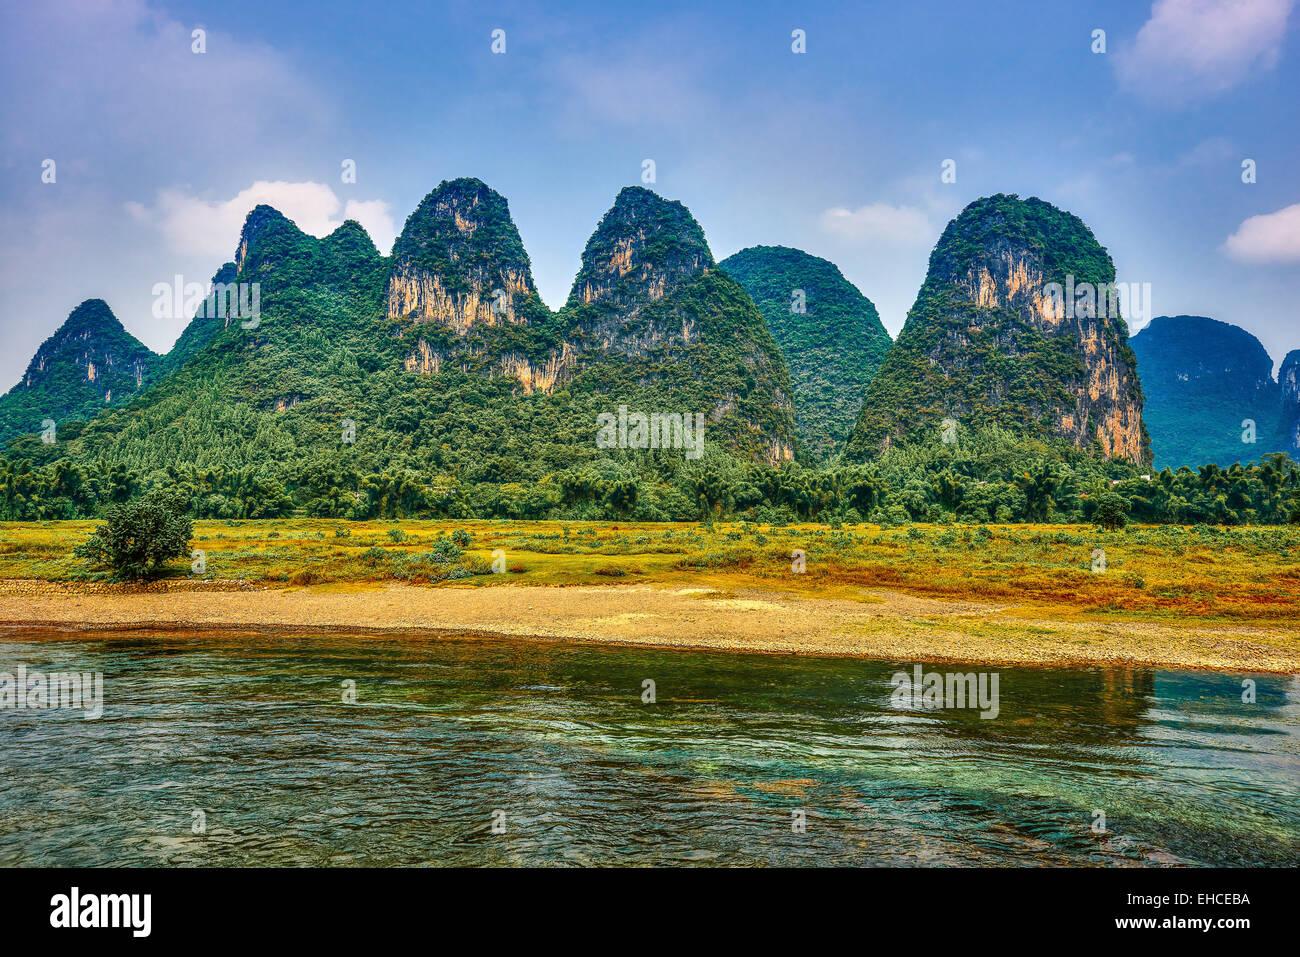 Il fiume Li, tra Guilin e Yangshuo nella provincia di Guangxi Cina Immagini Stock